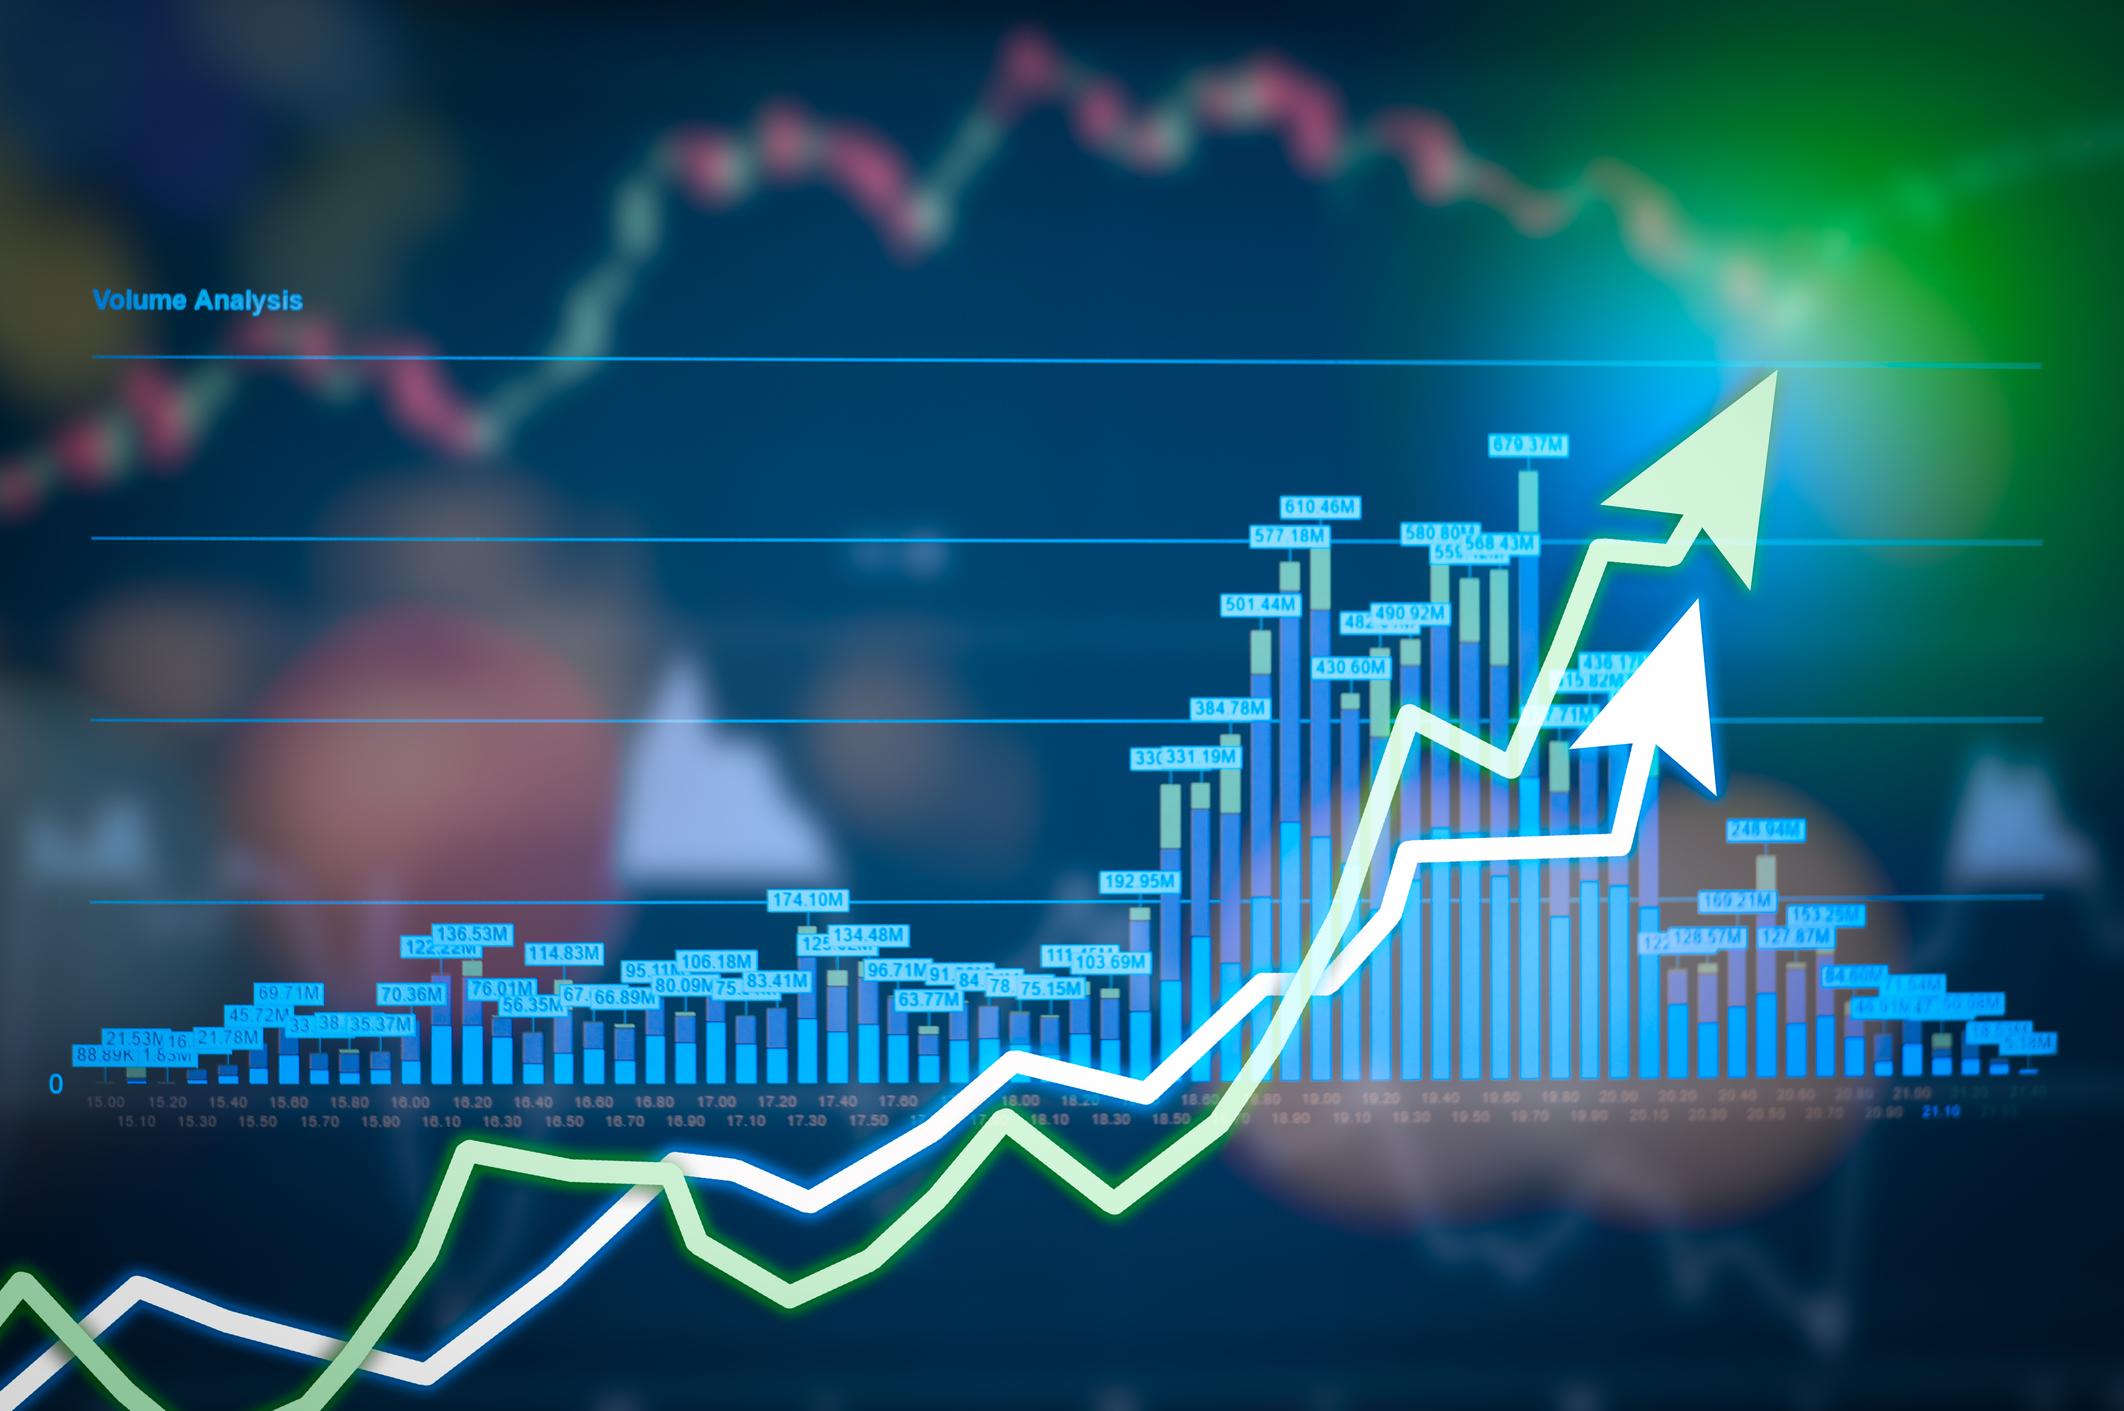 Colorful Stock market charts indicating gains